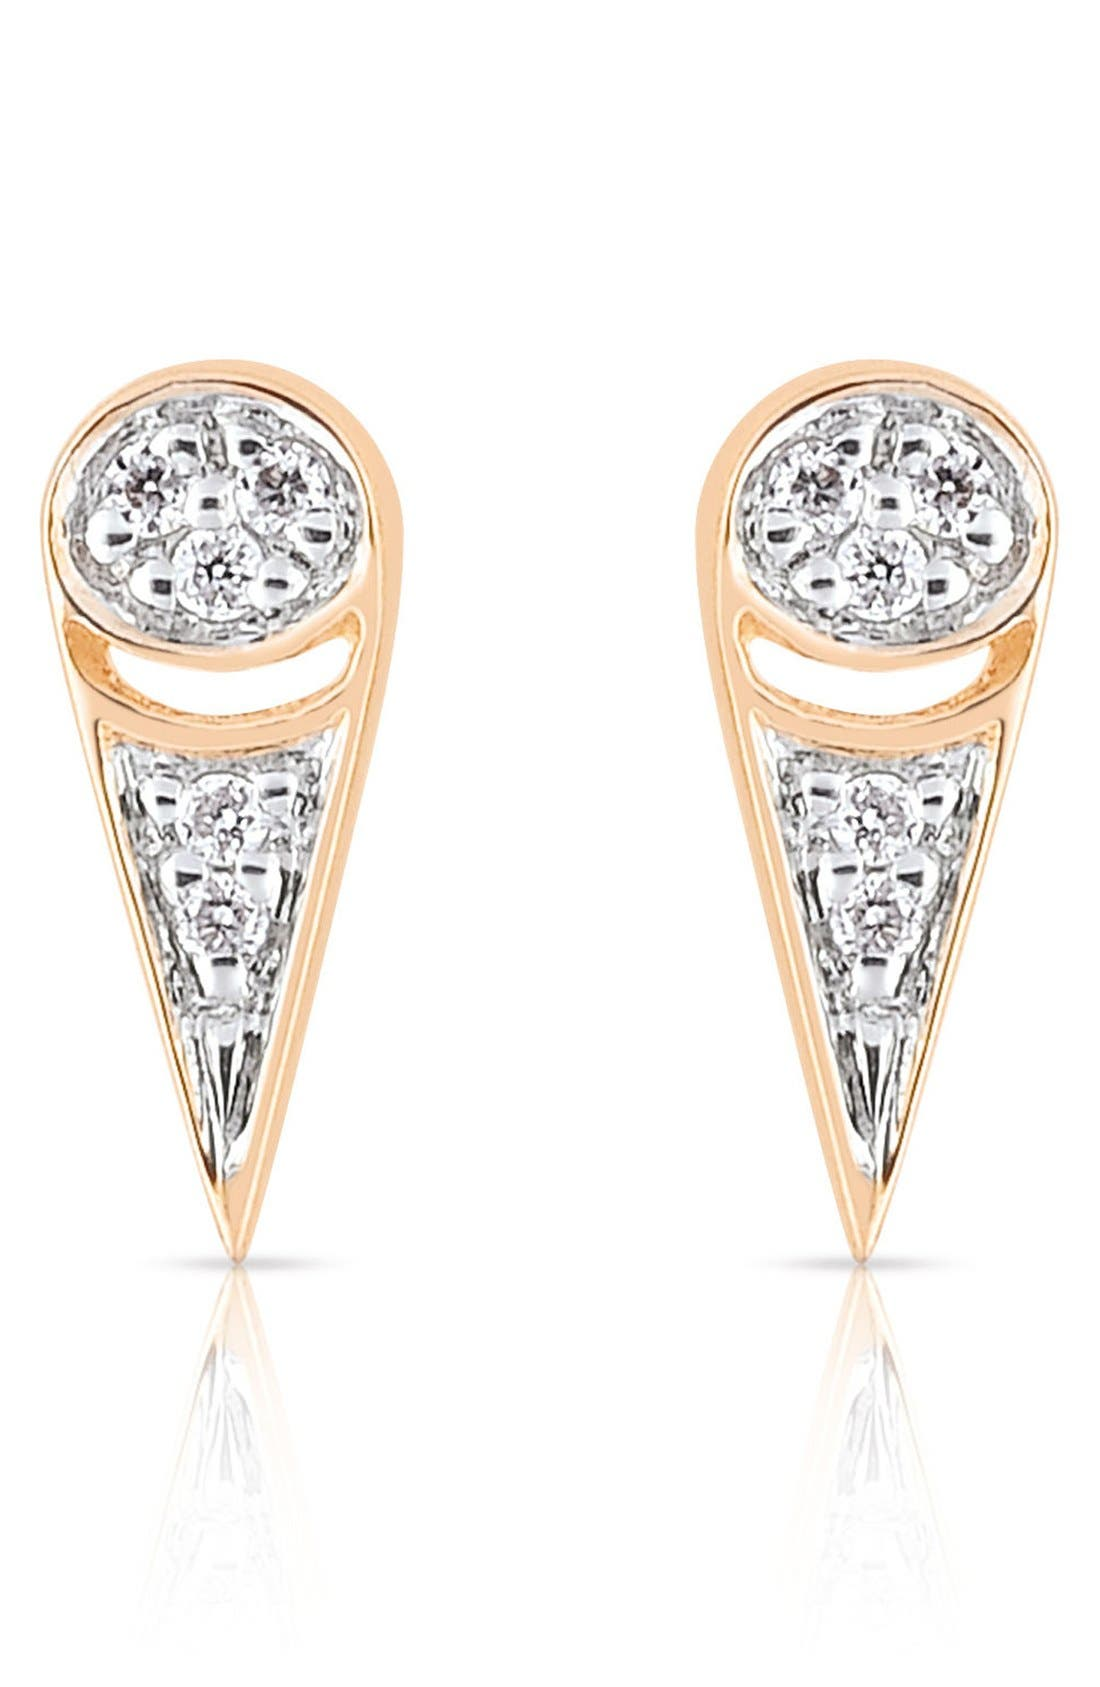 Main Image - ginette ny 'Mrs. Joe' Diamond Stud Earrings